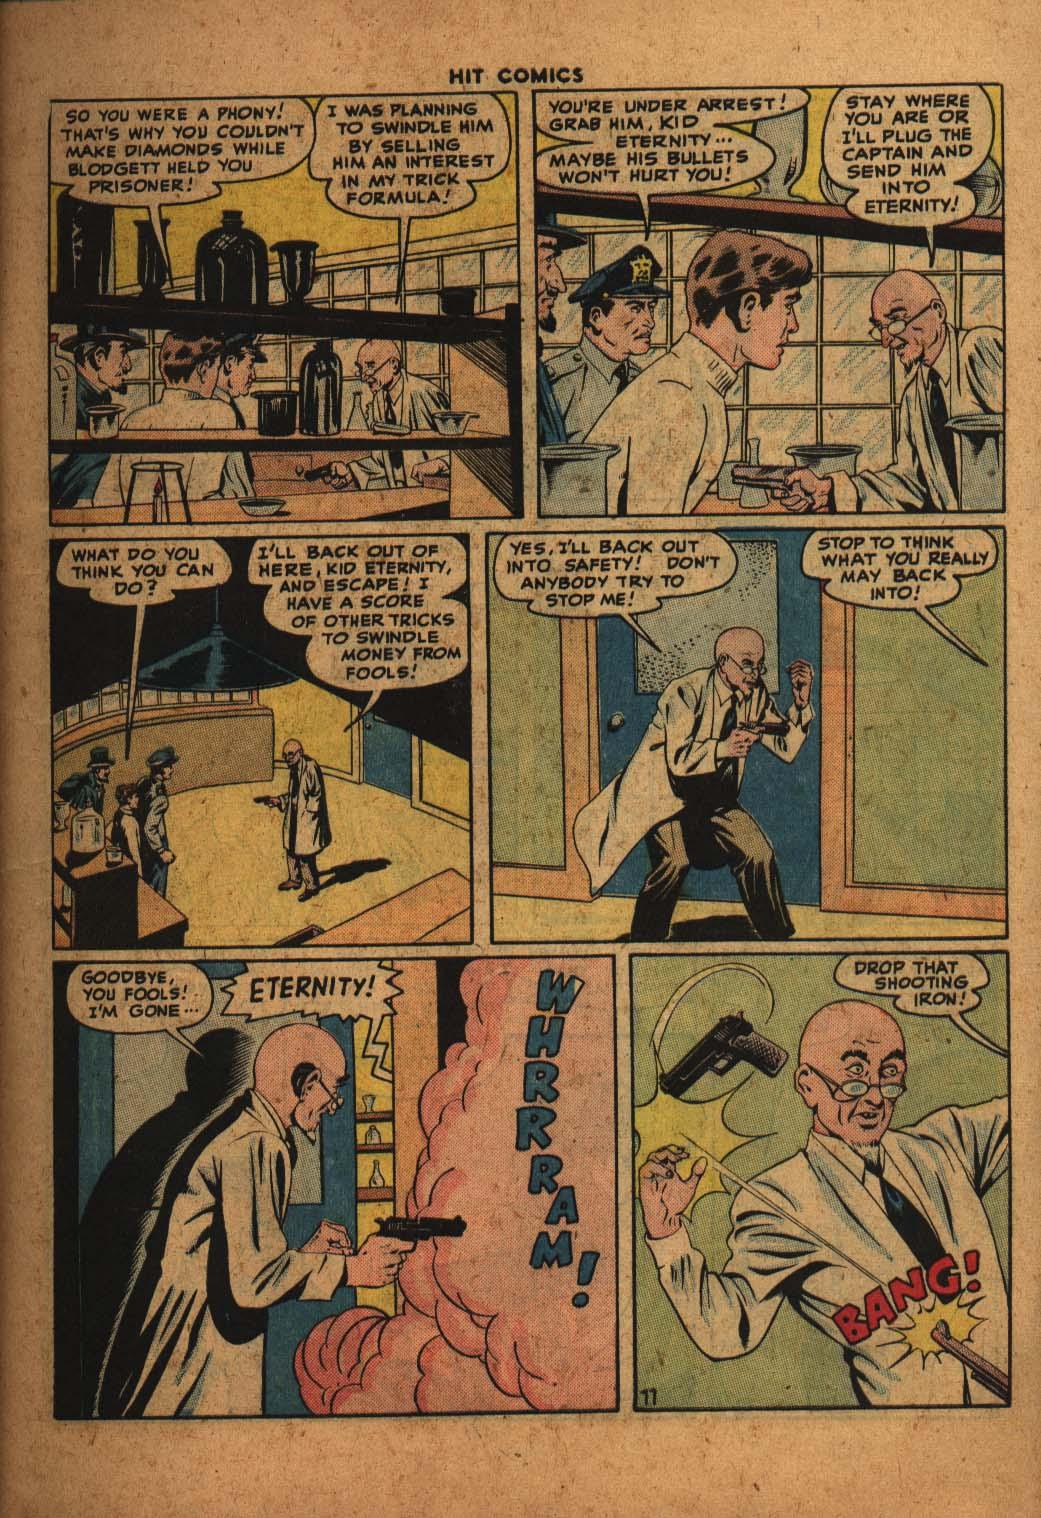 Read online Hit Comics comic -  Issue #47 - 12